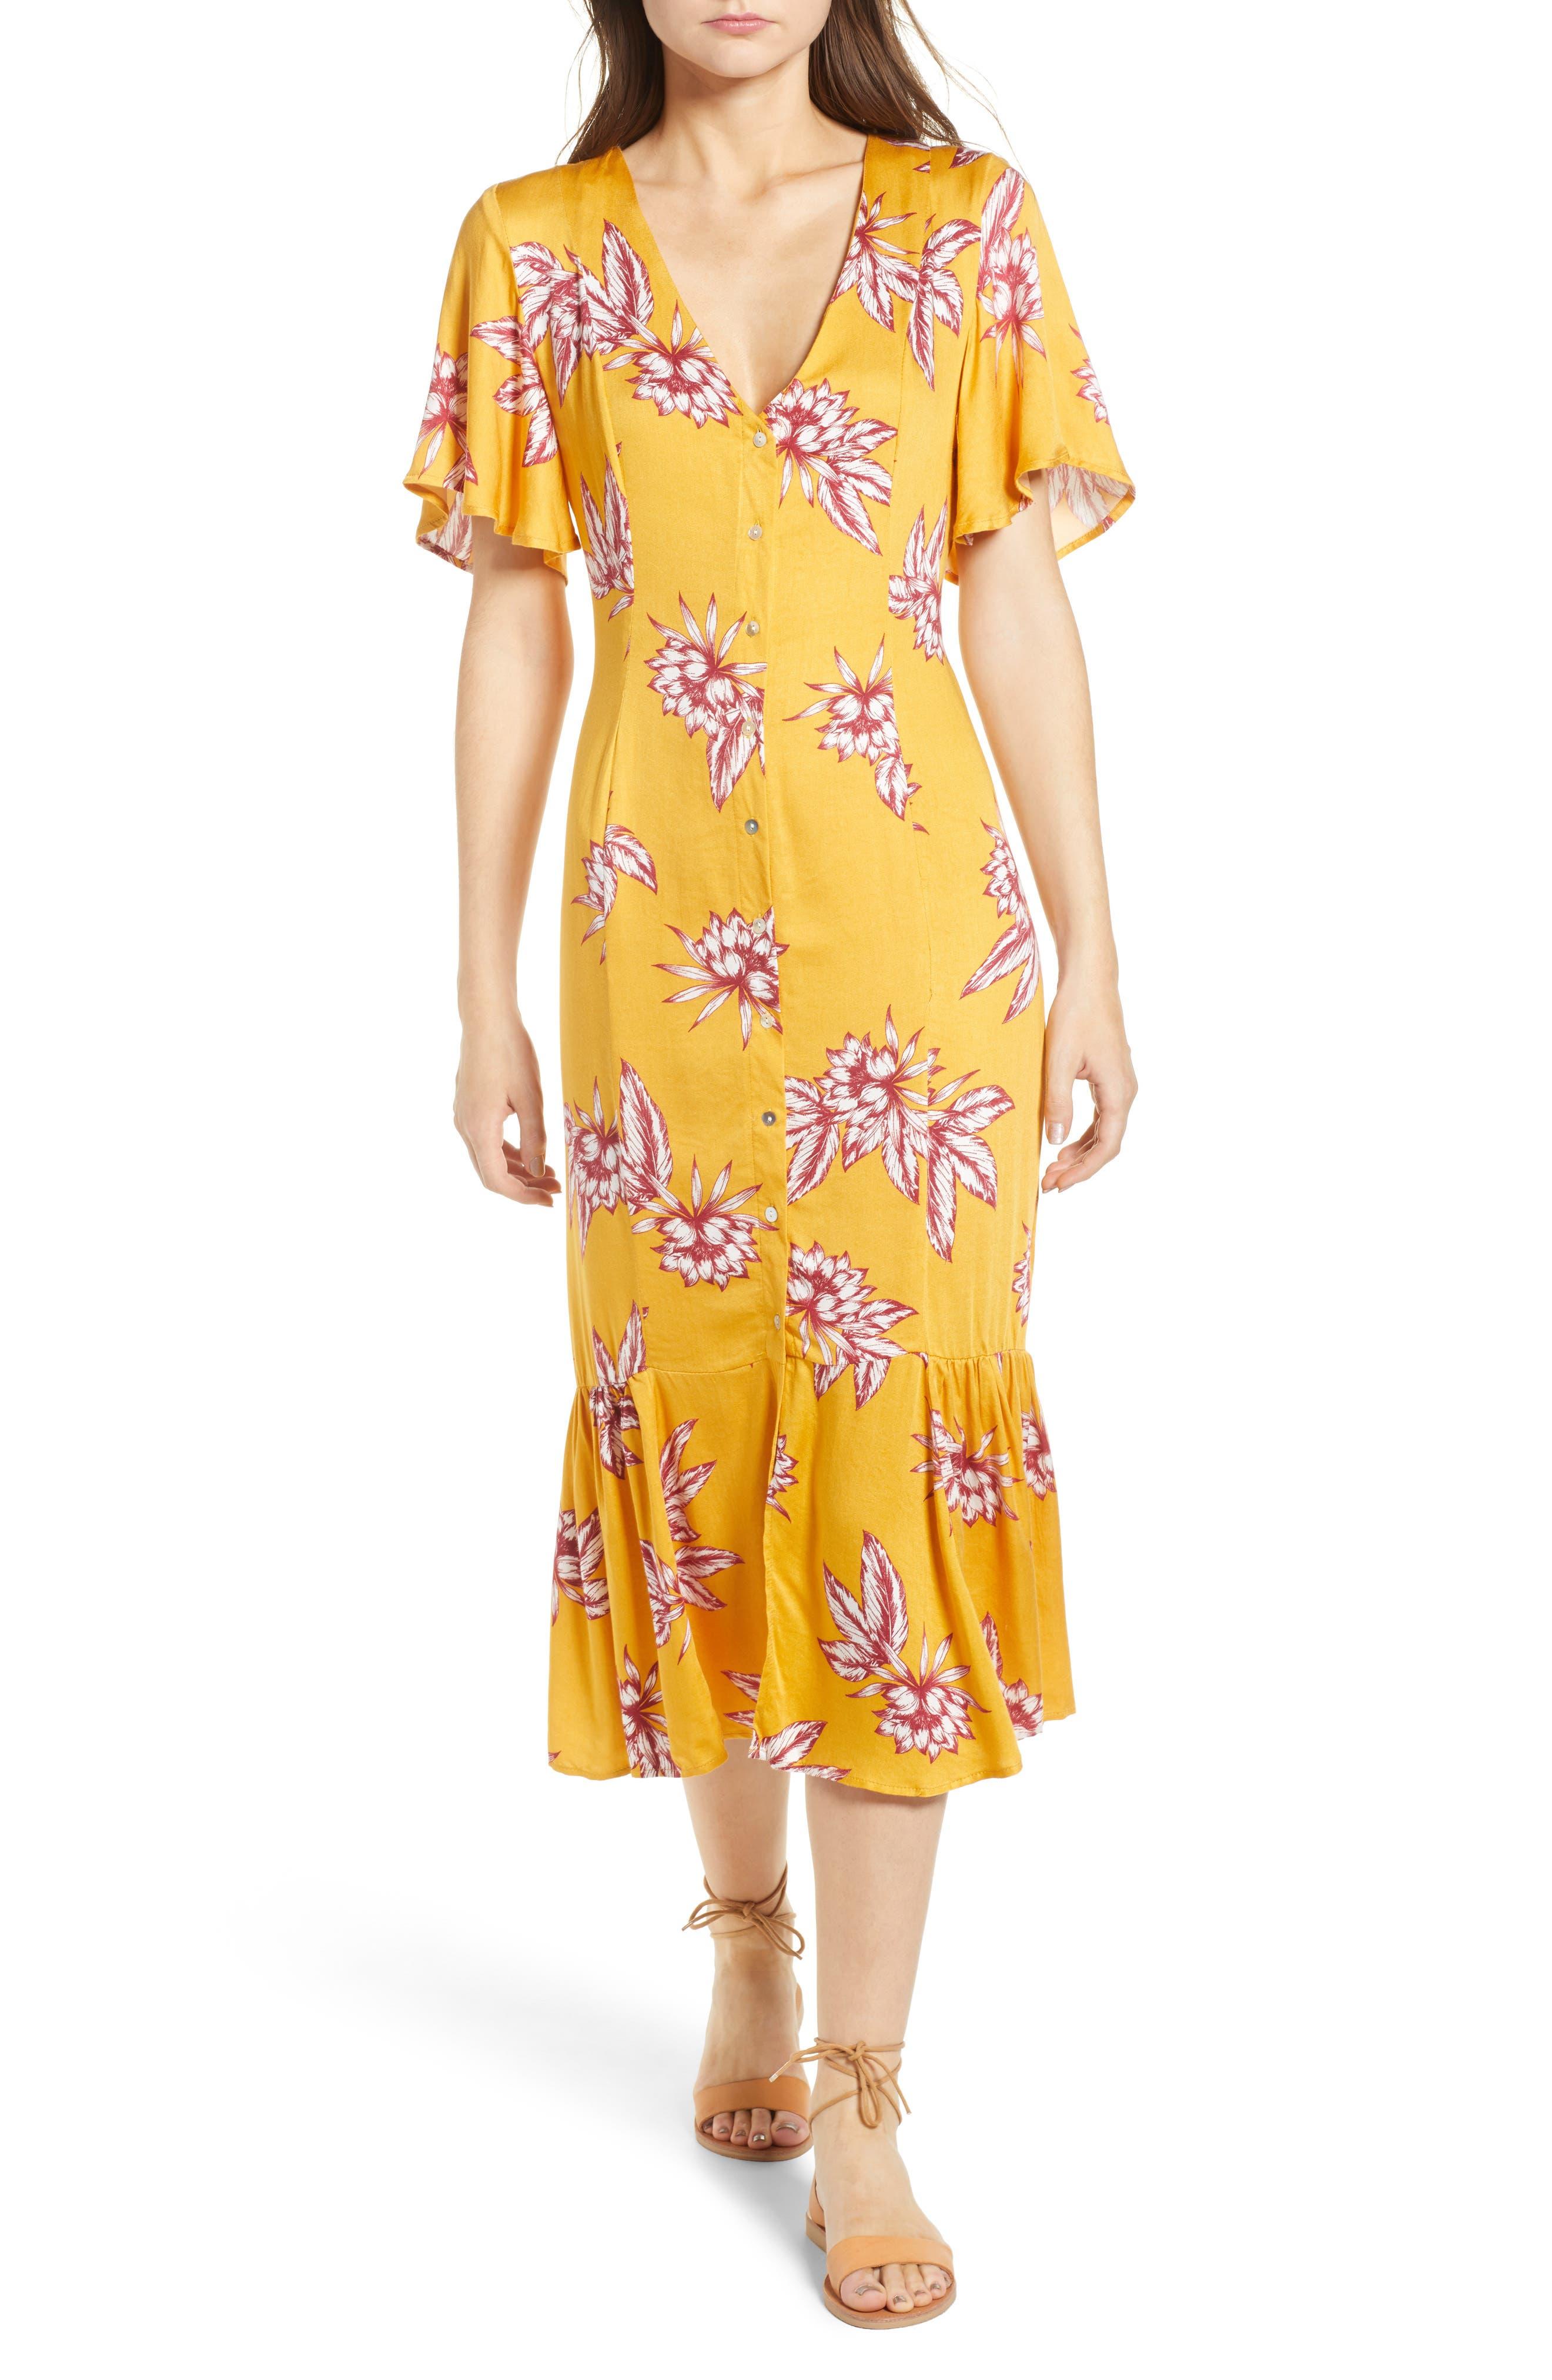 Searing Soul Midi Dress,                         Main,                         color, Multi